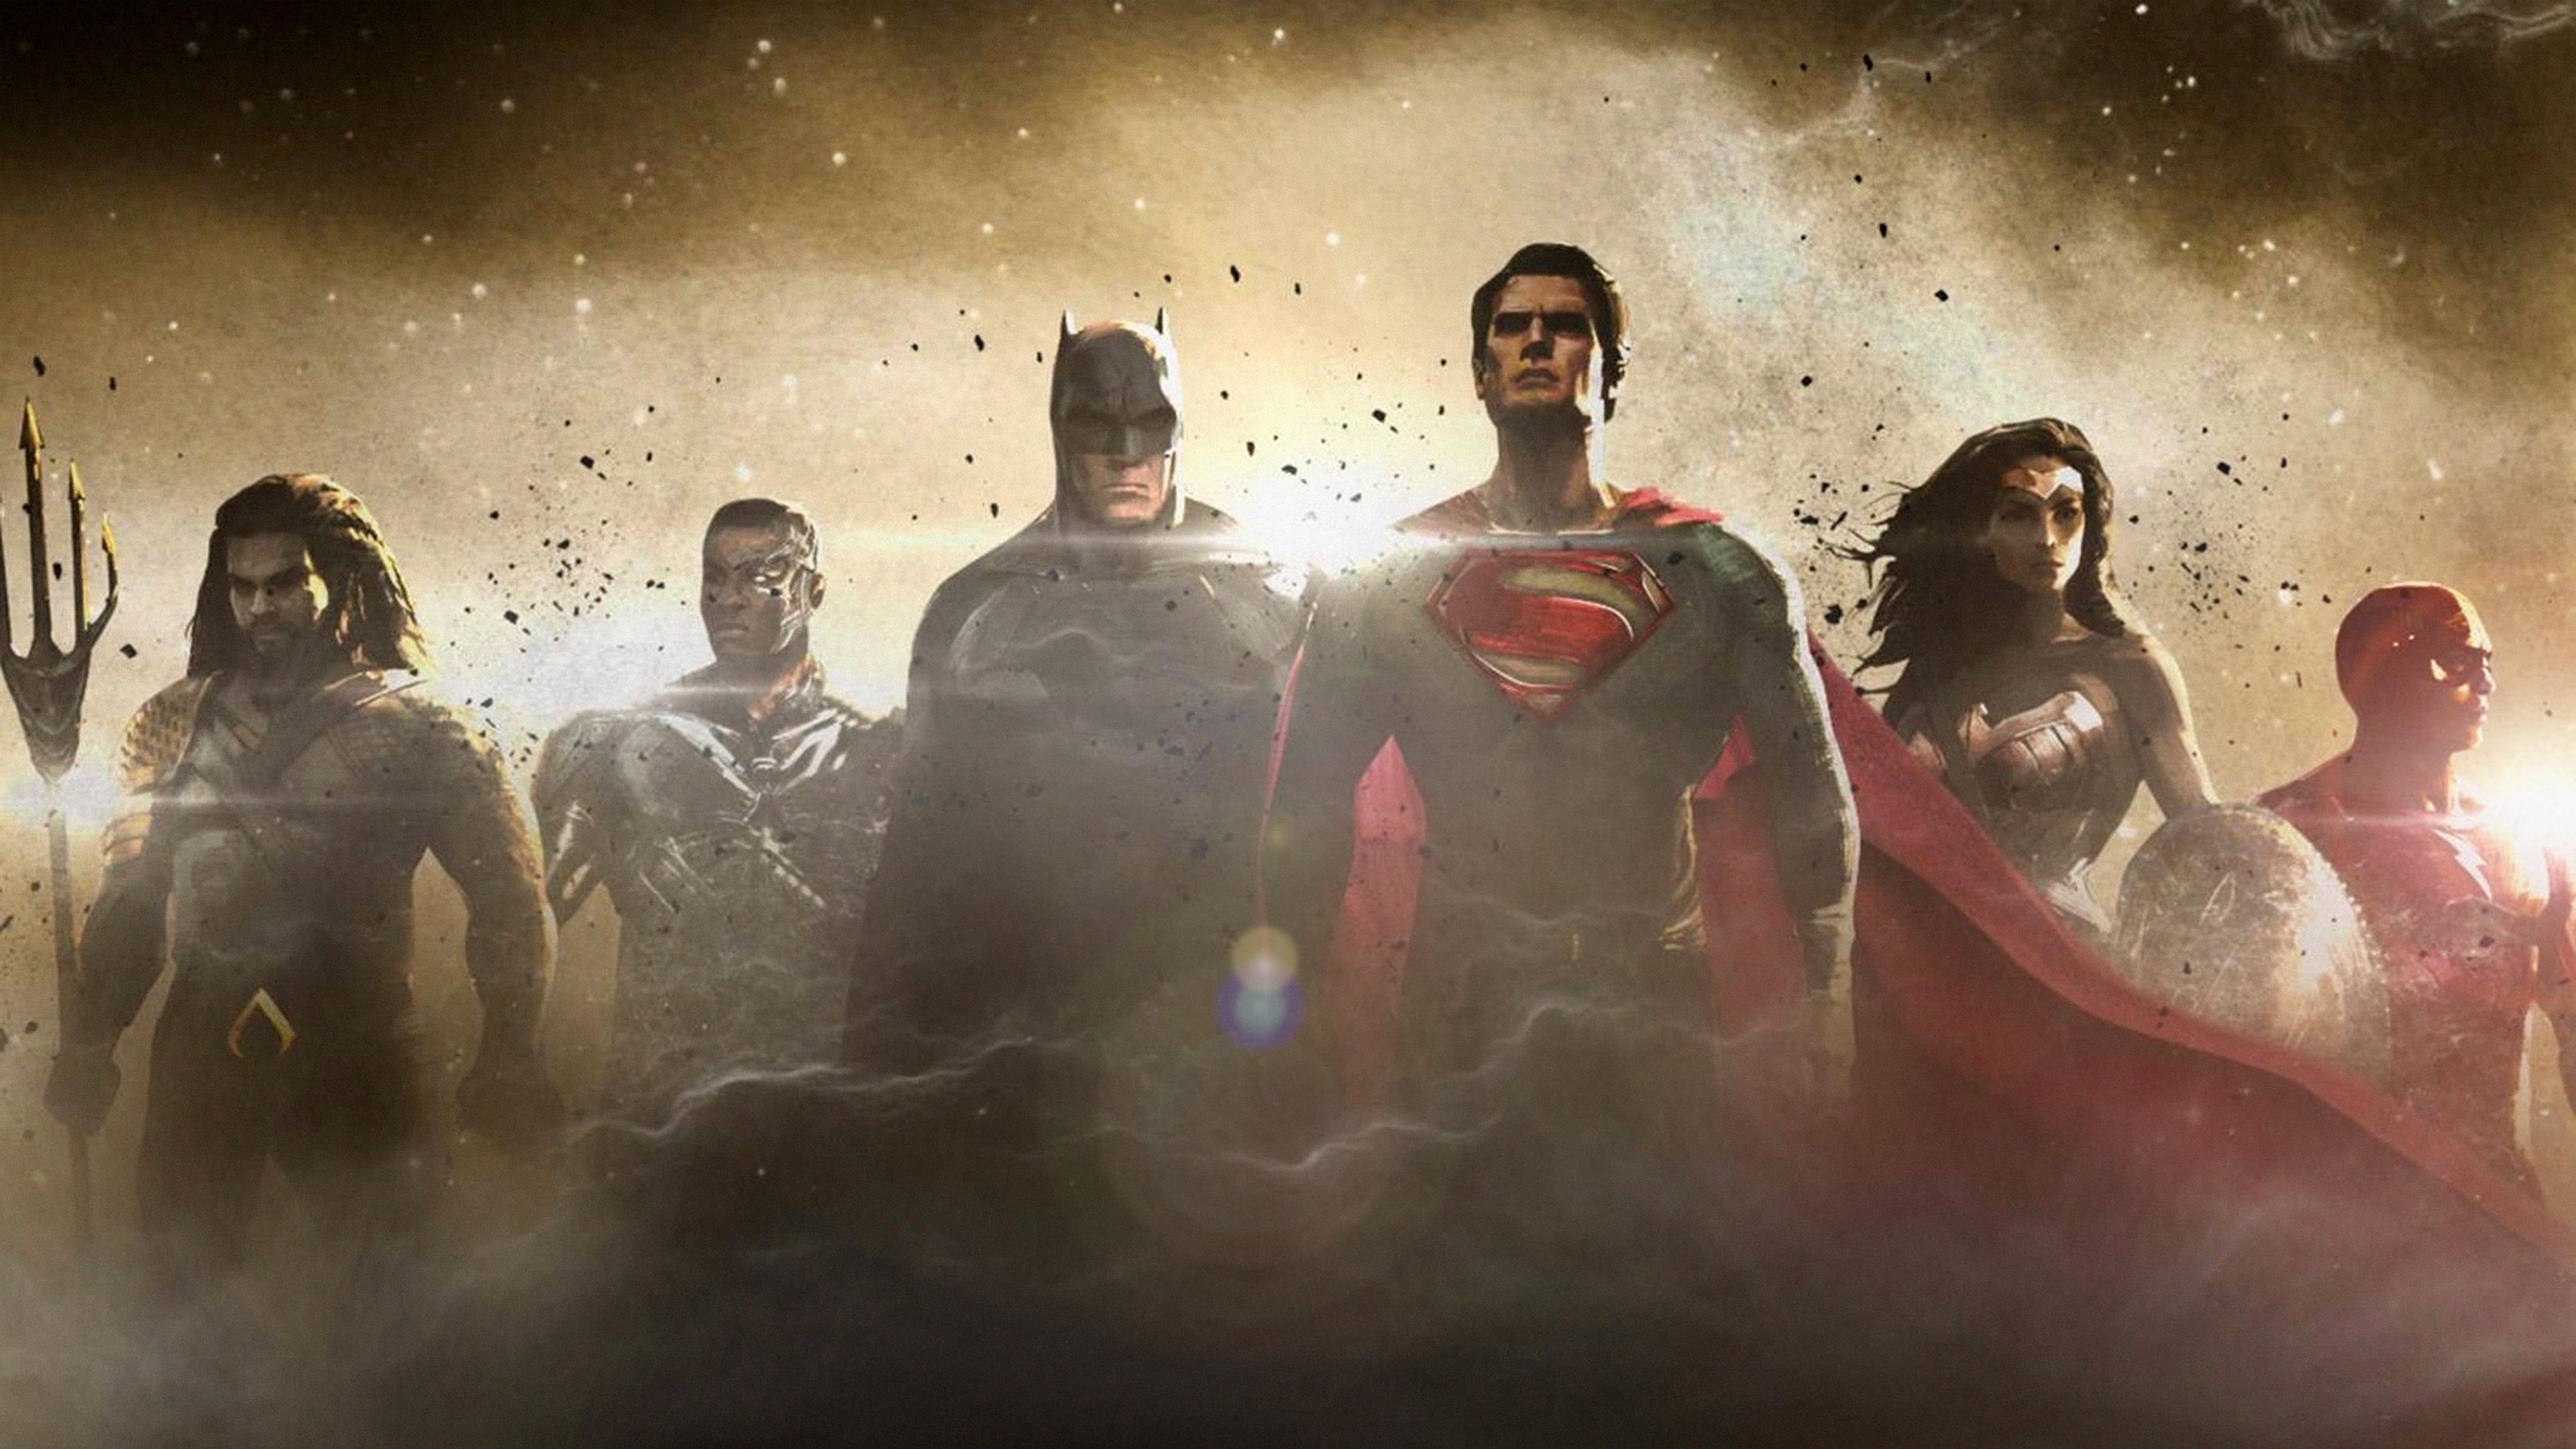 Justice League 2017 Movie 4k Hd Desktop Wallpaper For 4k: Justice League (2017) 4k Ultra HD Wallpaper